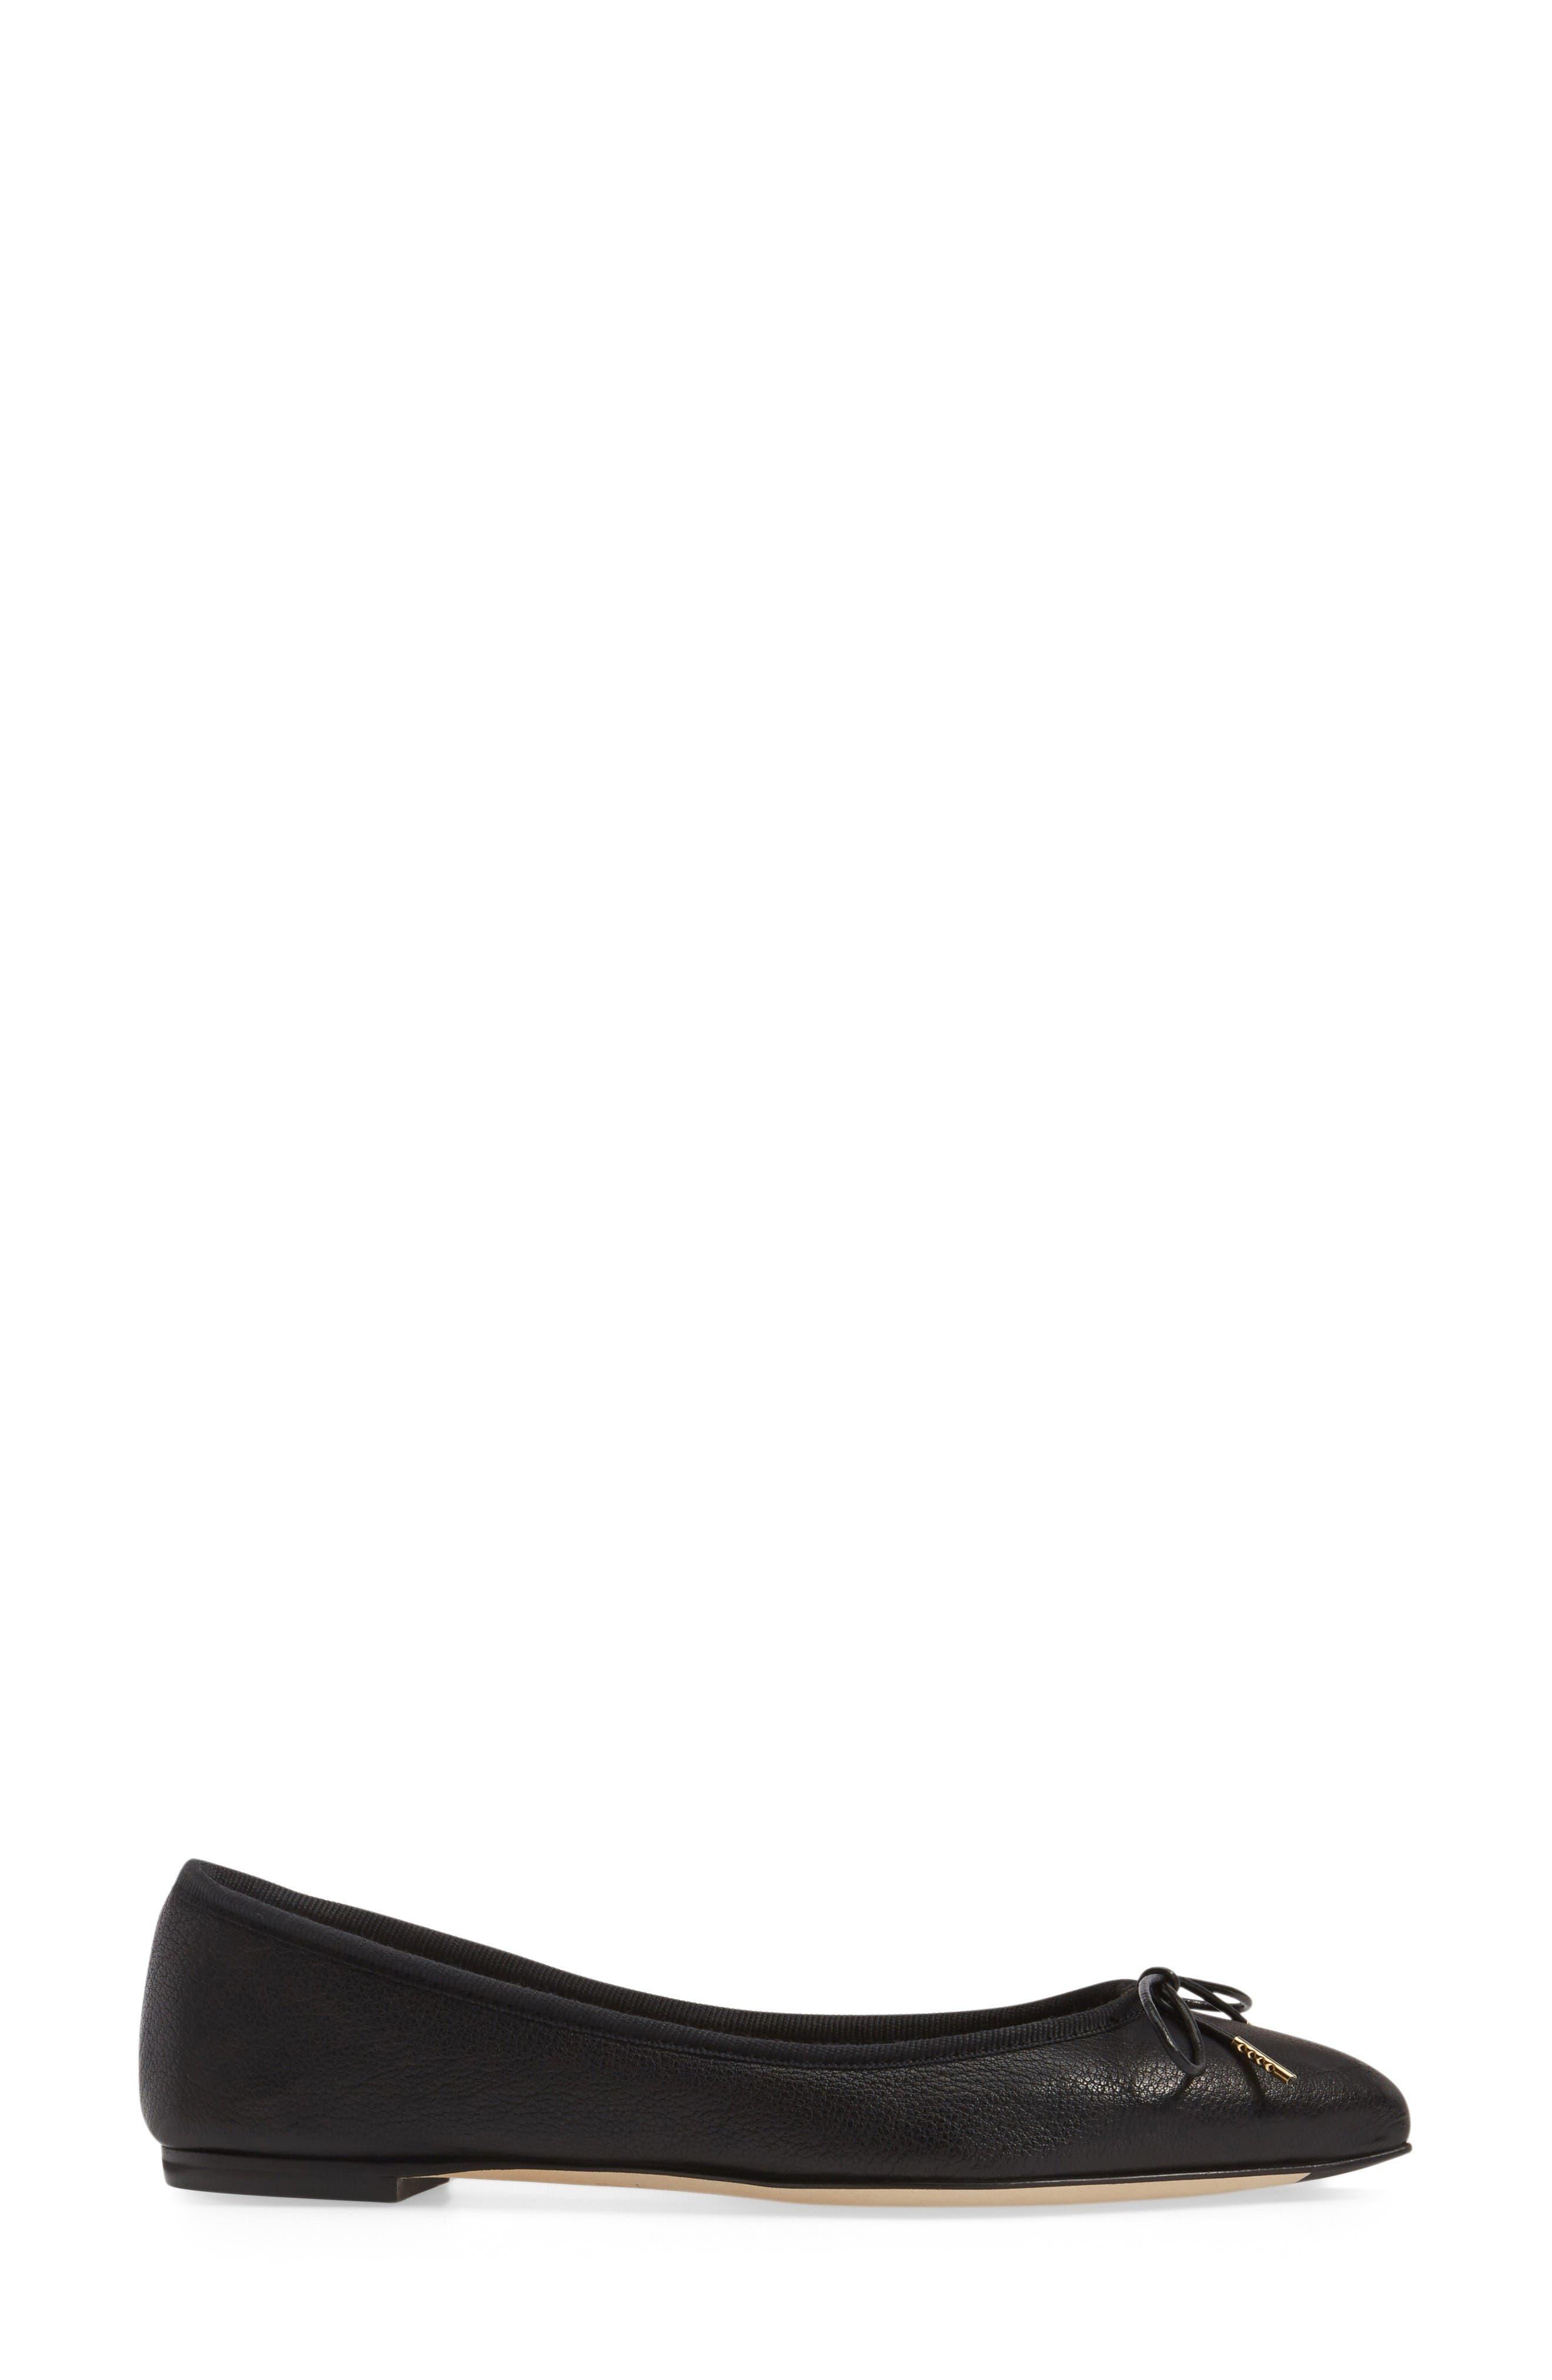 Alternate Image 3  - AGL Sacchetto Pointy Toe Flat (Women)